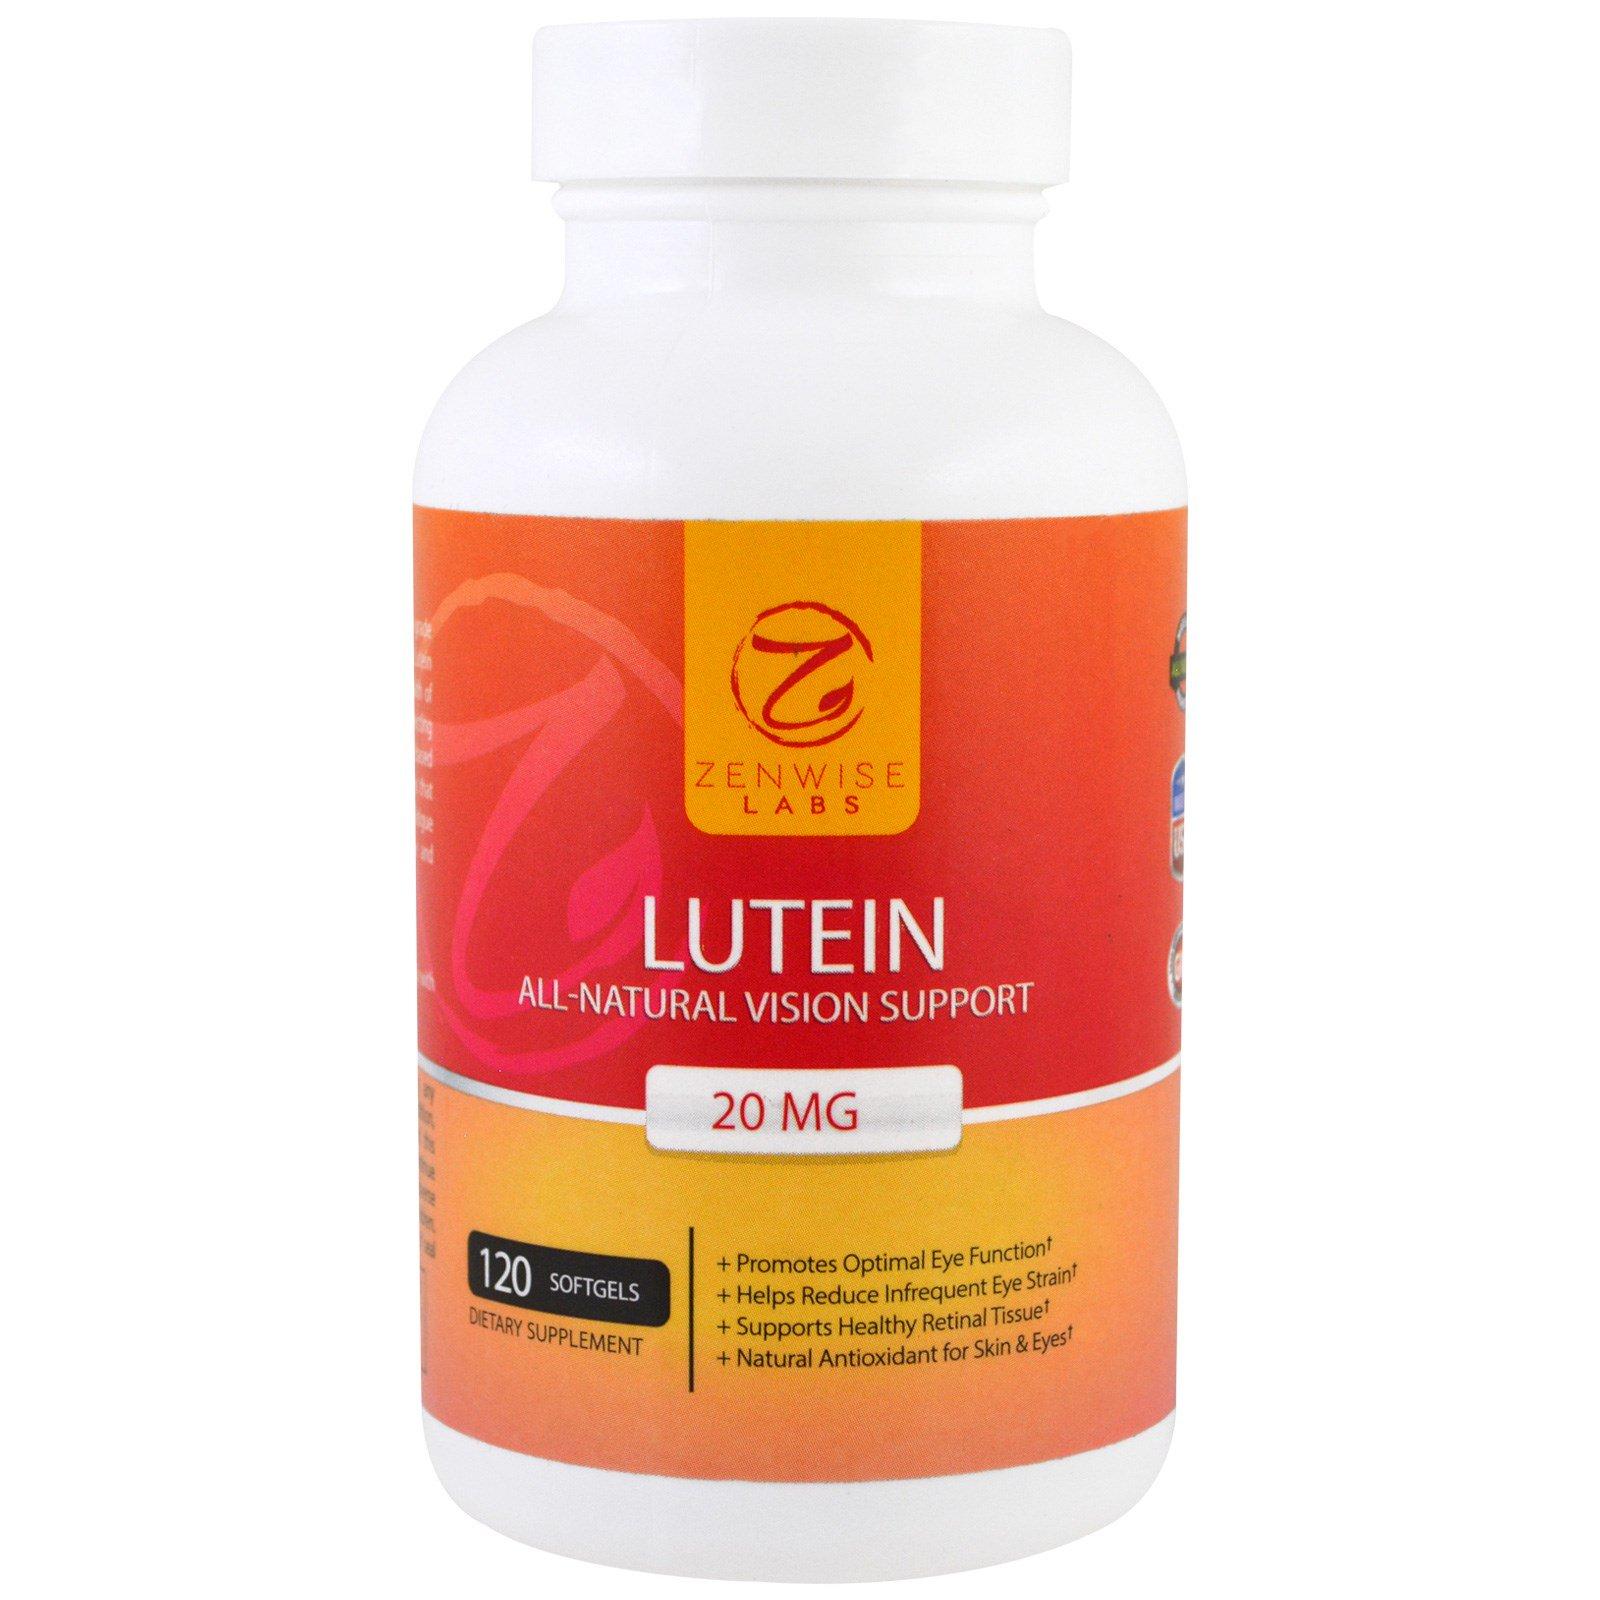 Zenwise Health, Лютеин, полностью натуральная поддержка зрения, 20 мг, 120 гелевых капсул